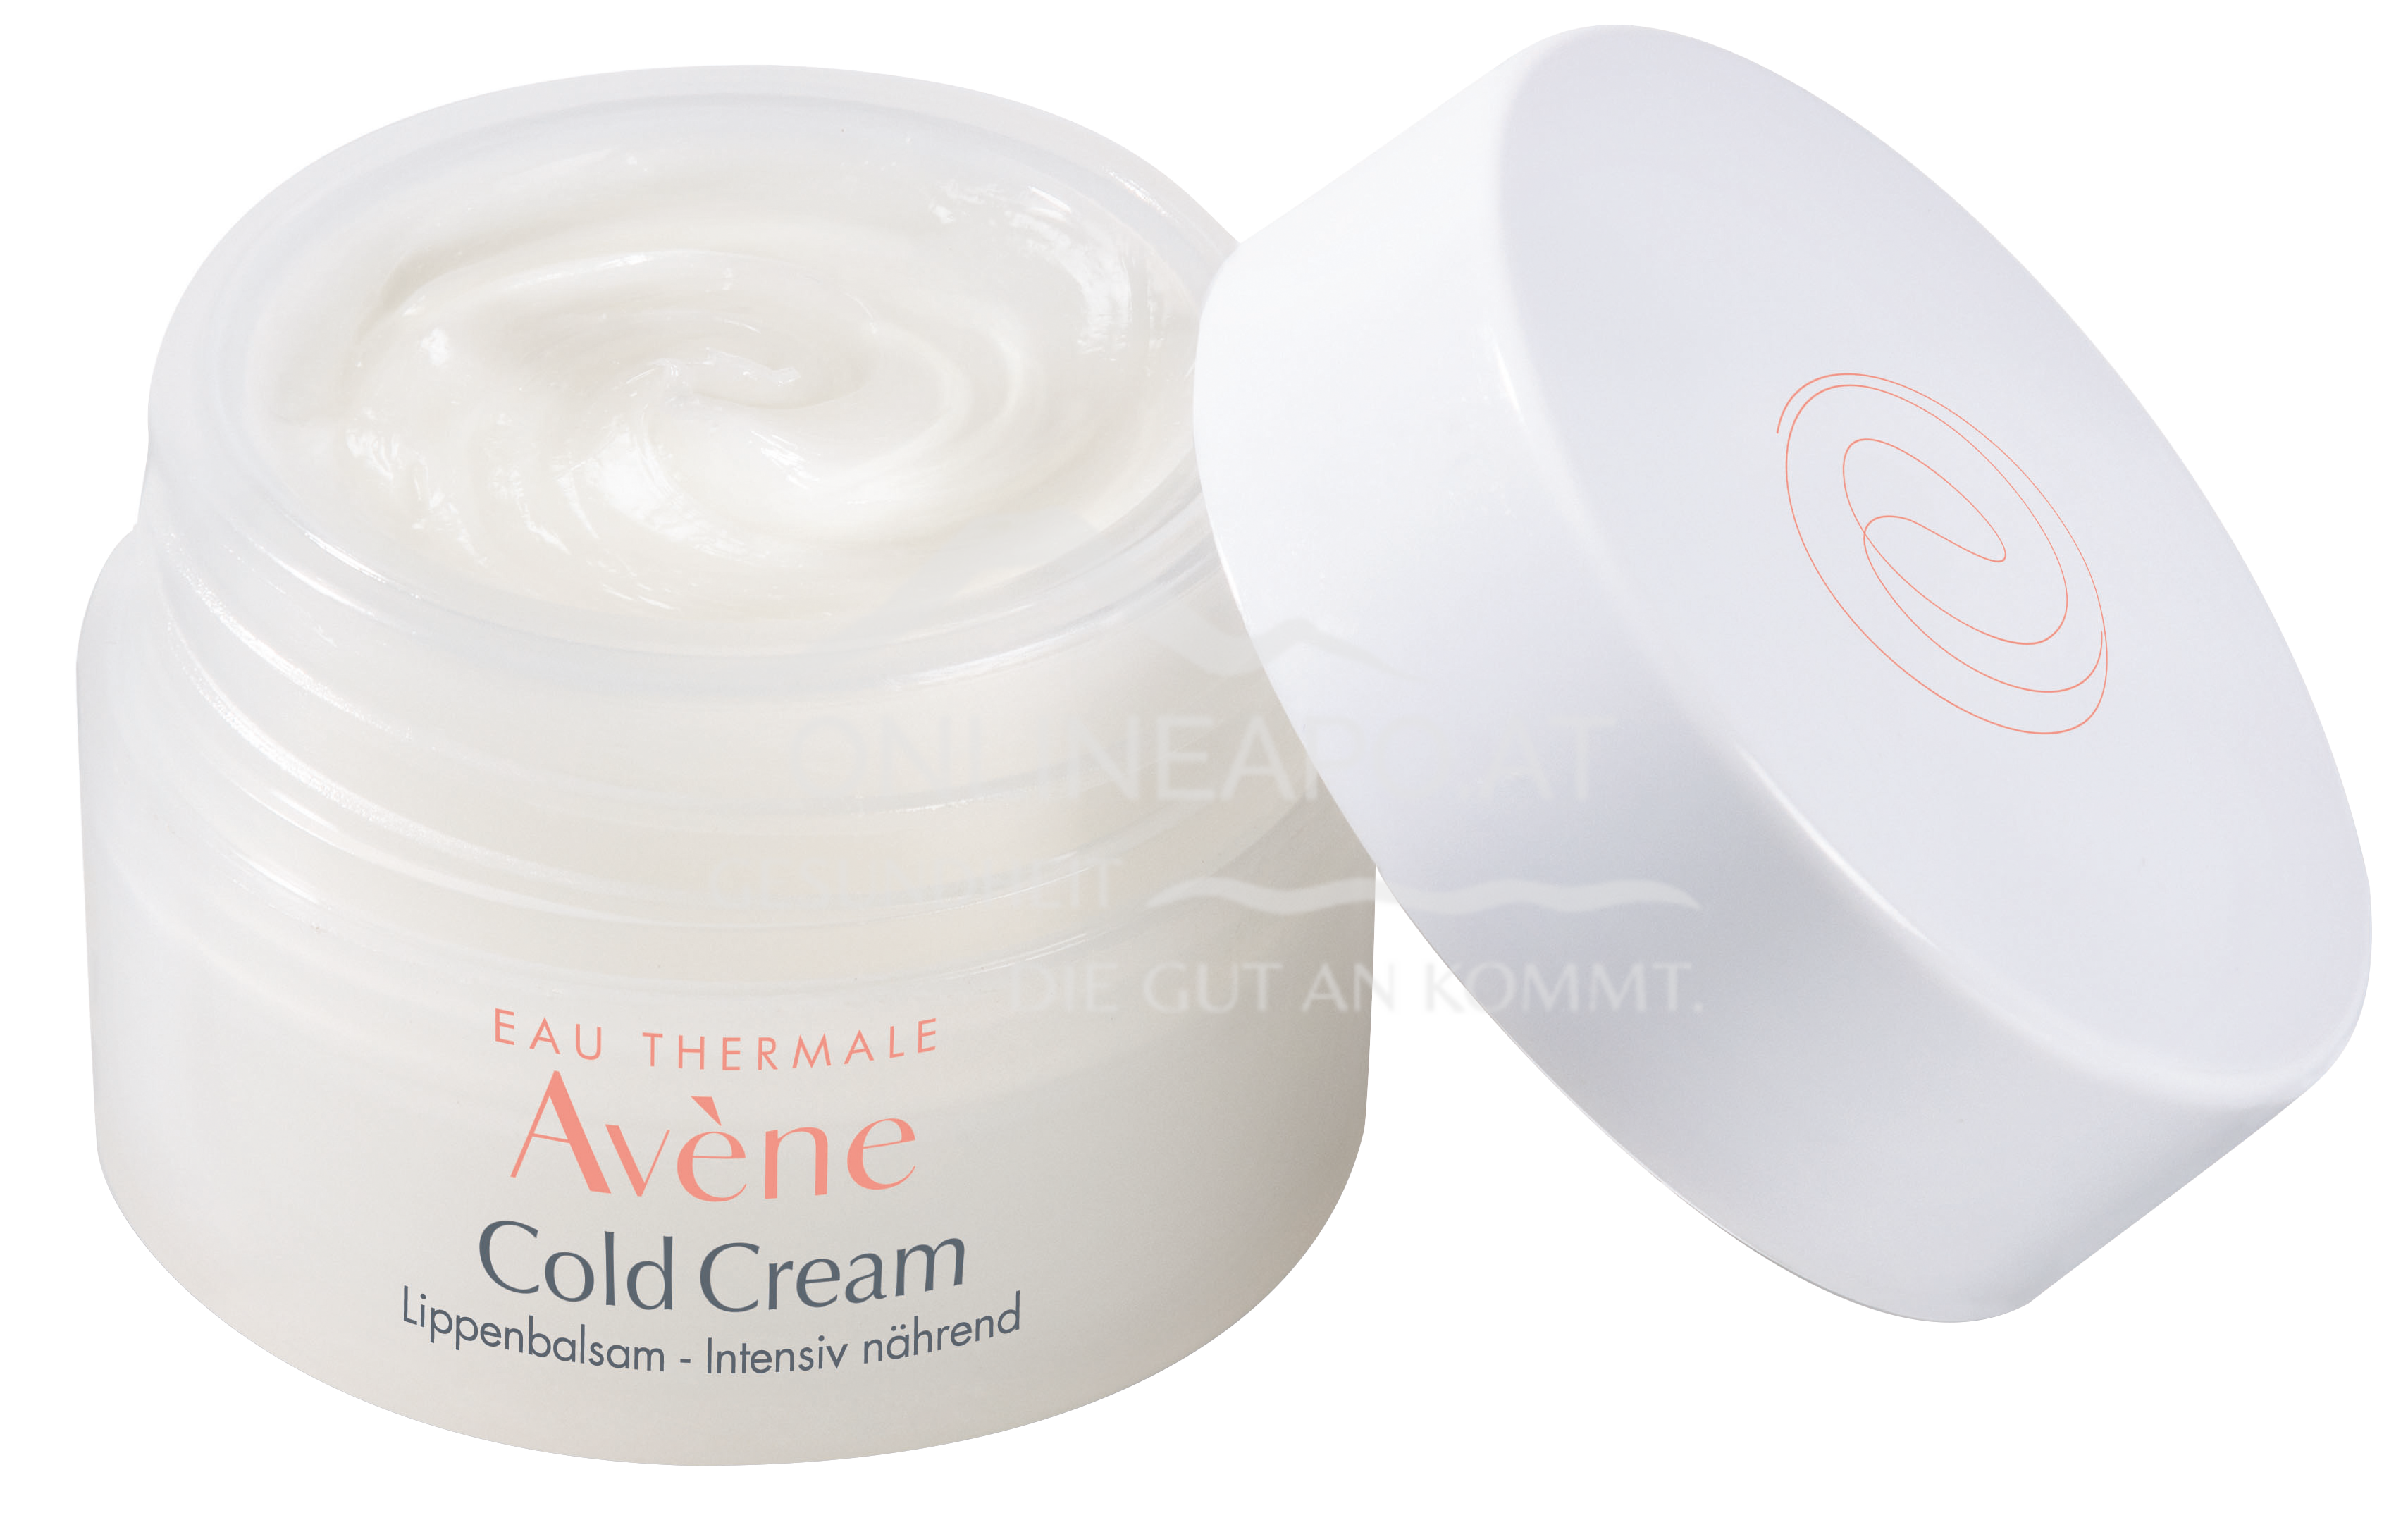 Avène Cold Cream Lippenbalsam - Intensiv Nährend